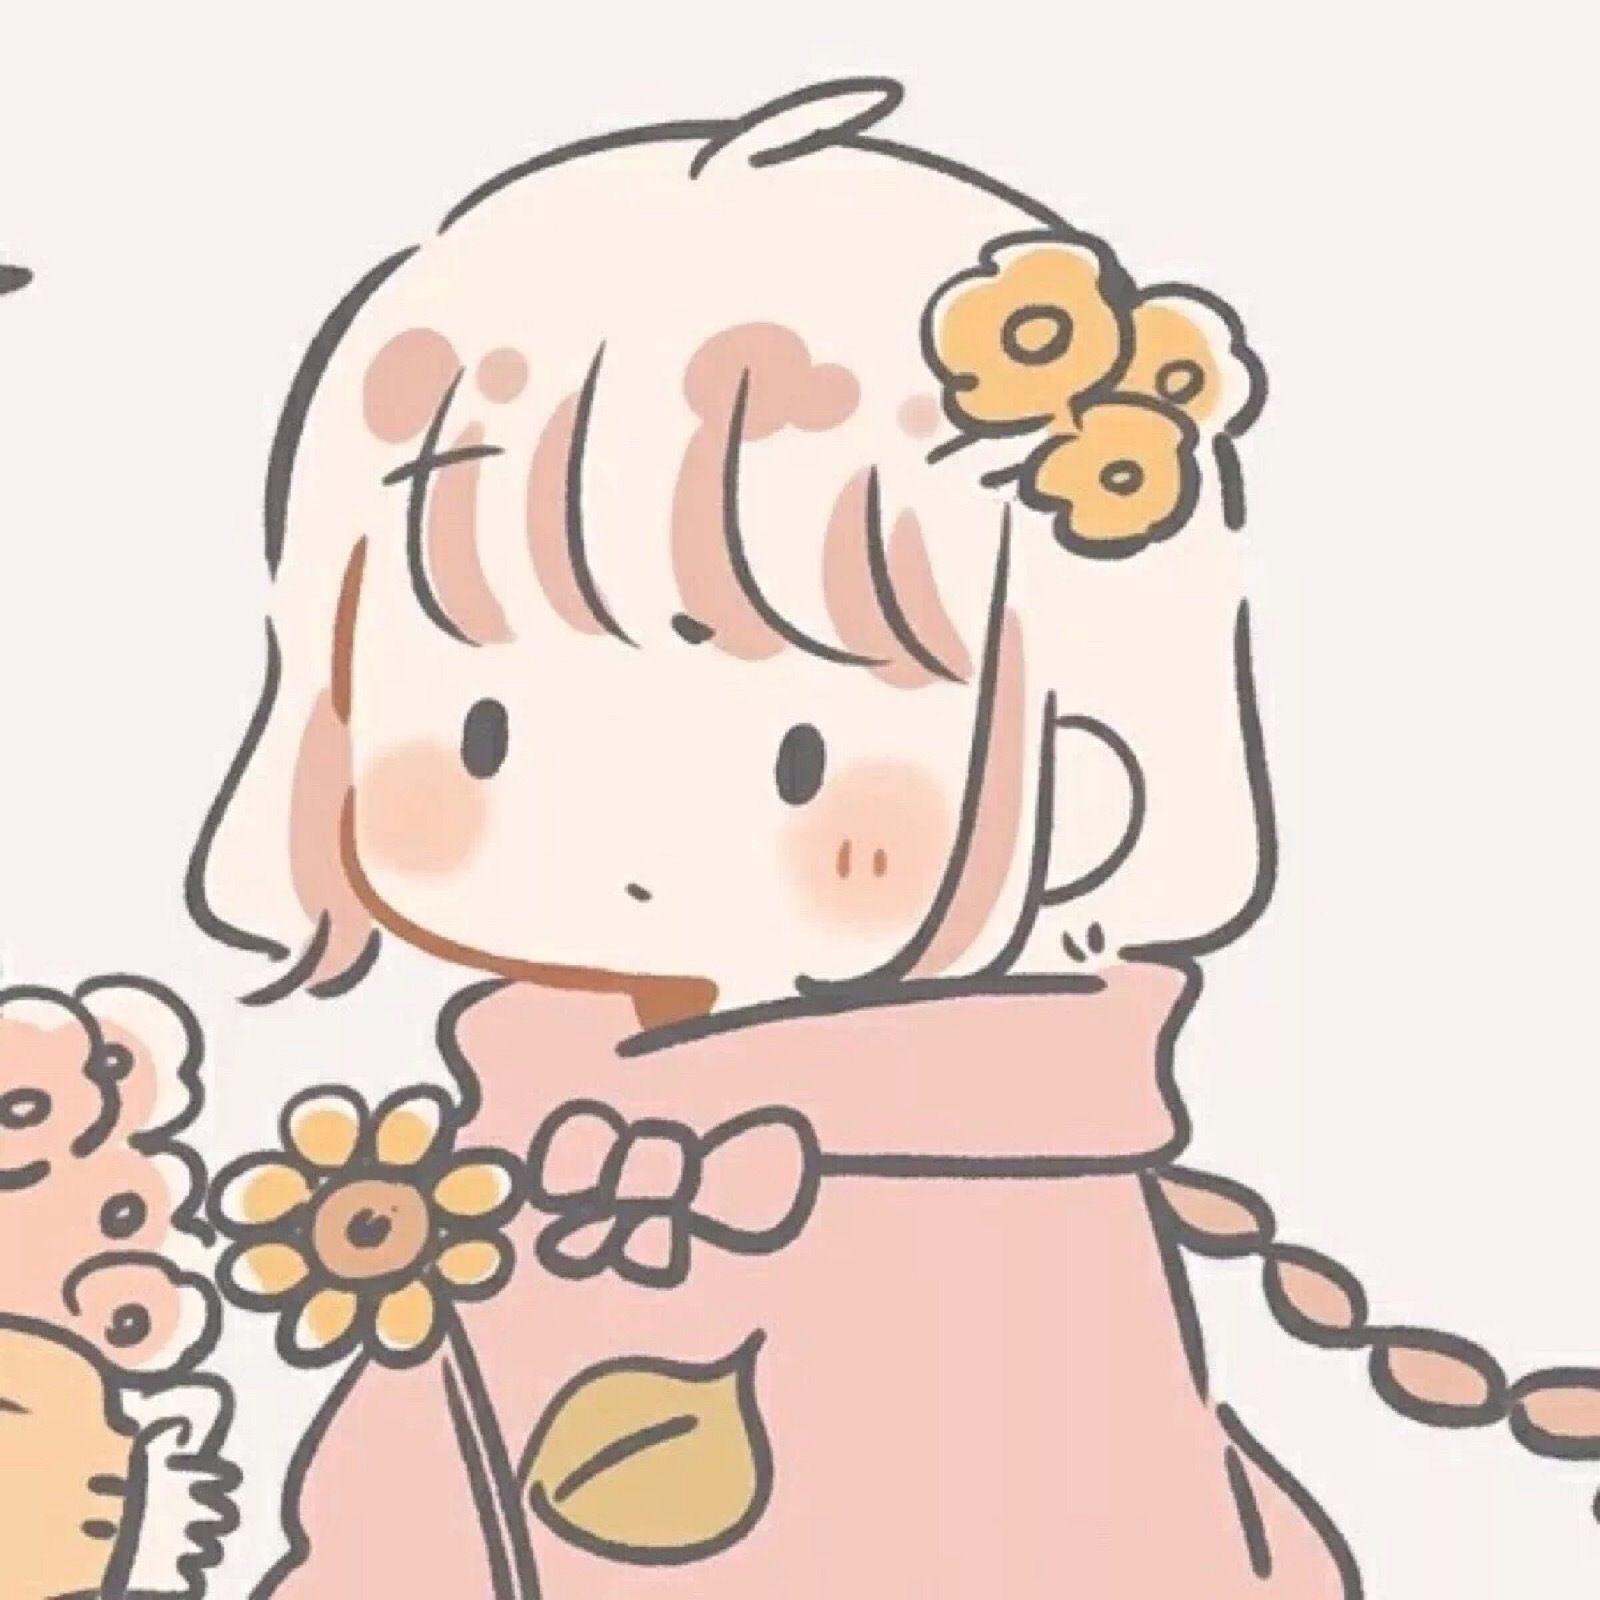 Pin By 拳拳之青 On 熊 兔 Cute Cartoon Wallpapers Friend Anime Cute Little Drawings